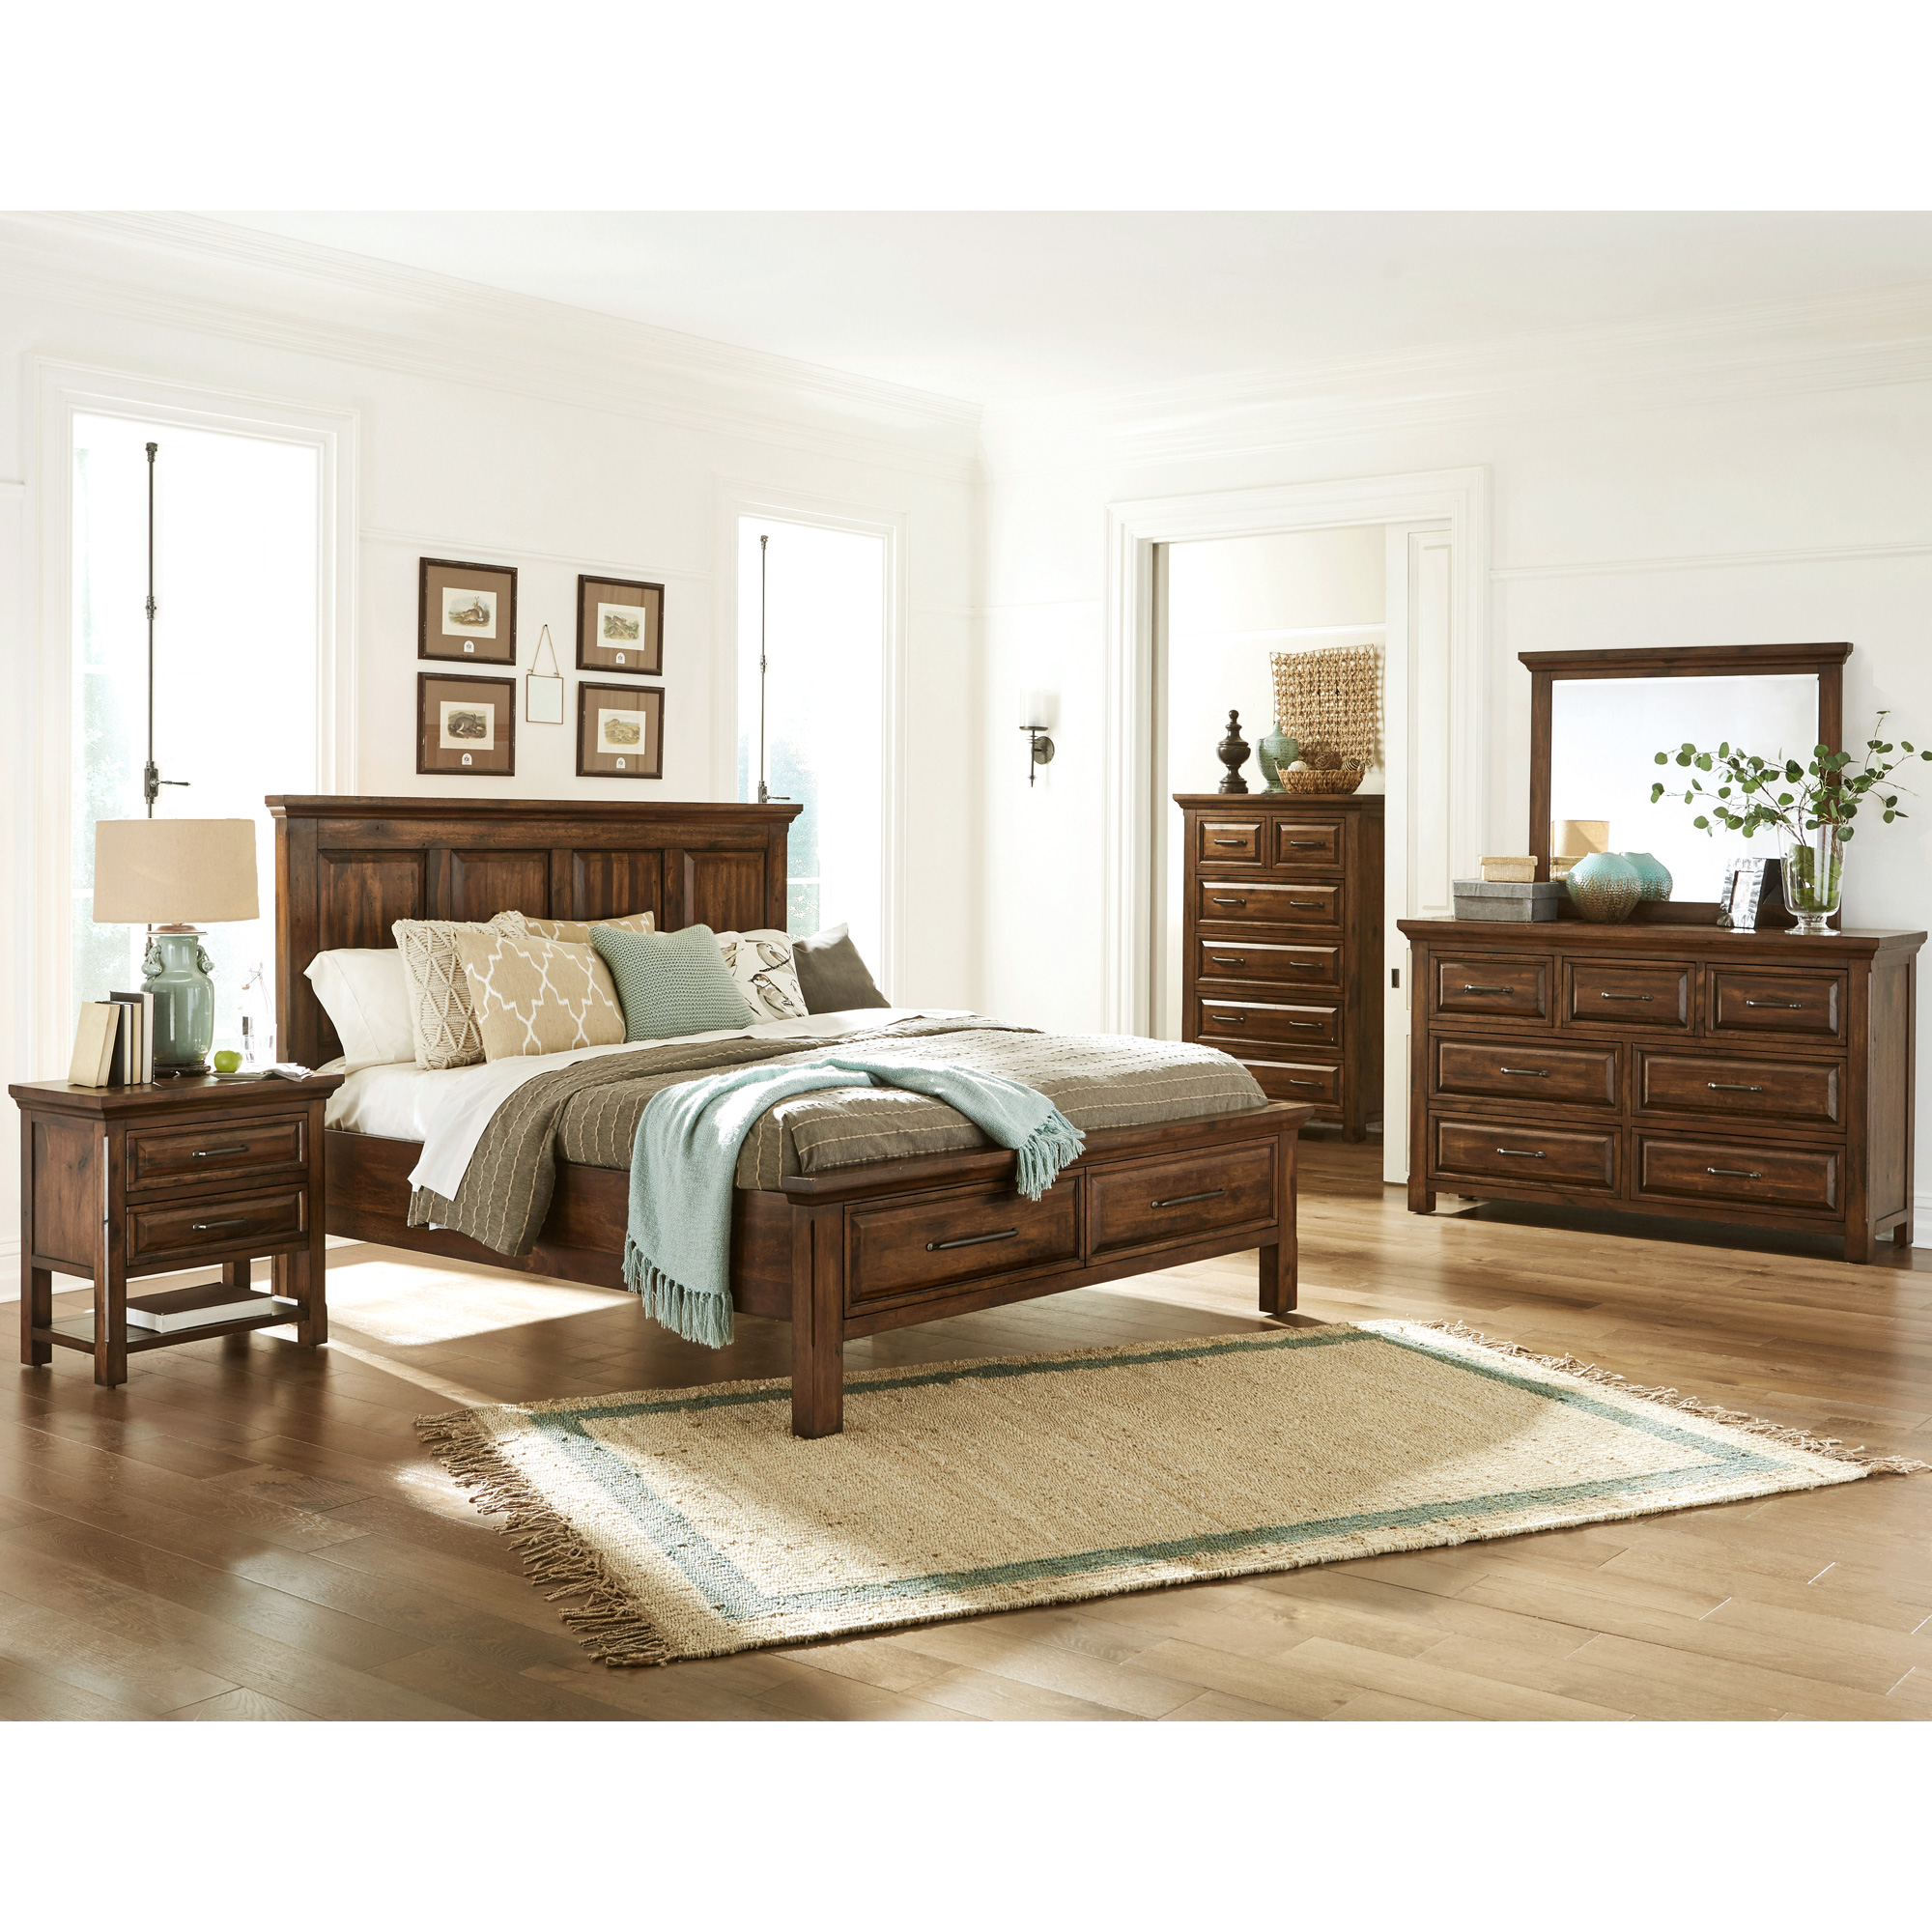 Napa Furniture | Hill Crest Dark Chestnut California King 4 Piece Room Group Bedroom Set